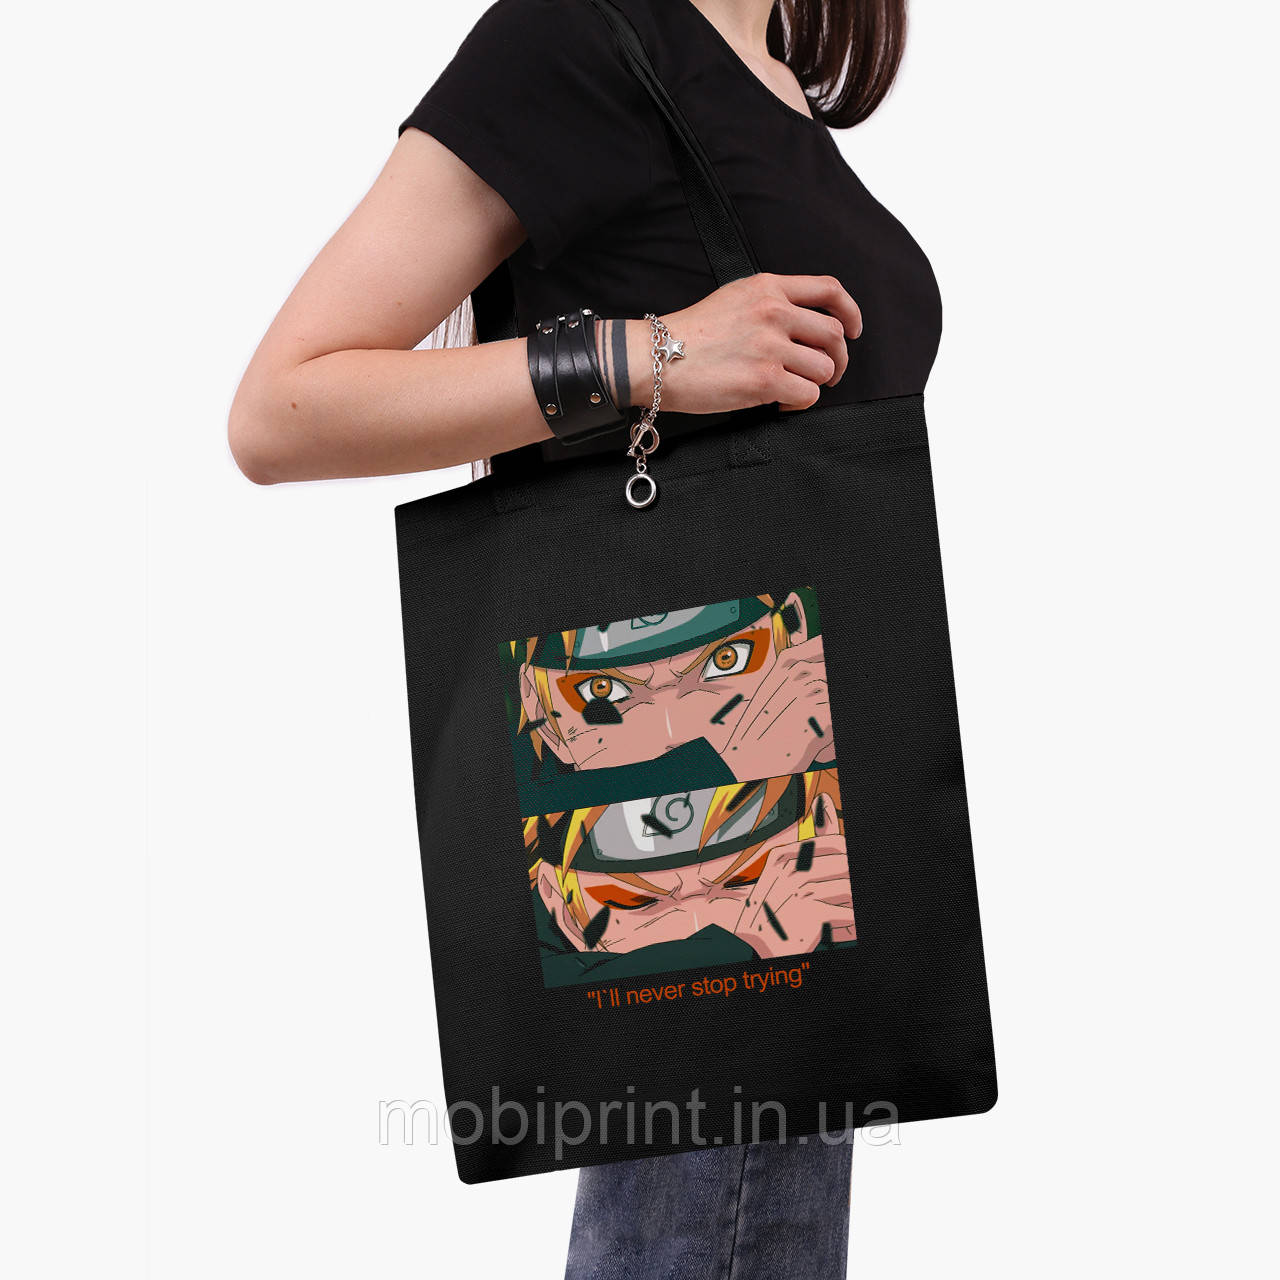 Еко сумка шоппер чорна Наруто Узумакі (Naruto Uzumaki) (9227-2816-2) 41*35 см